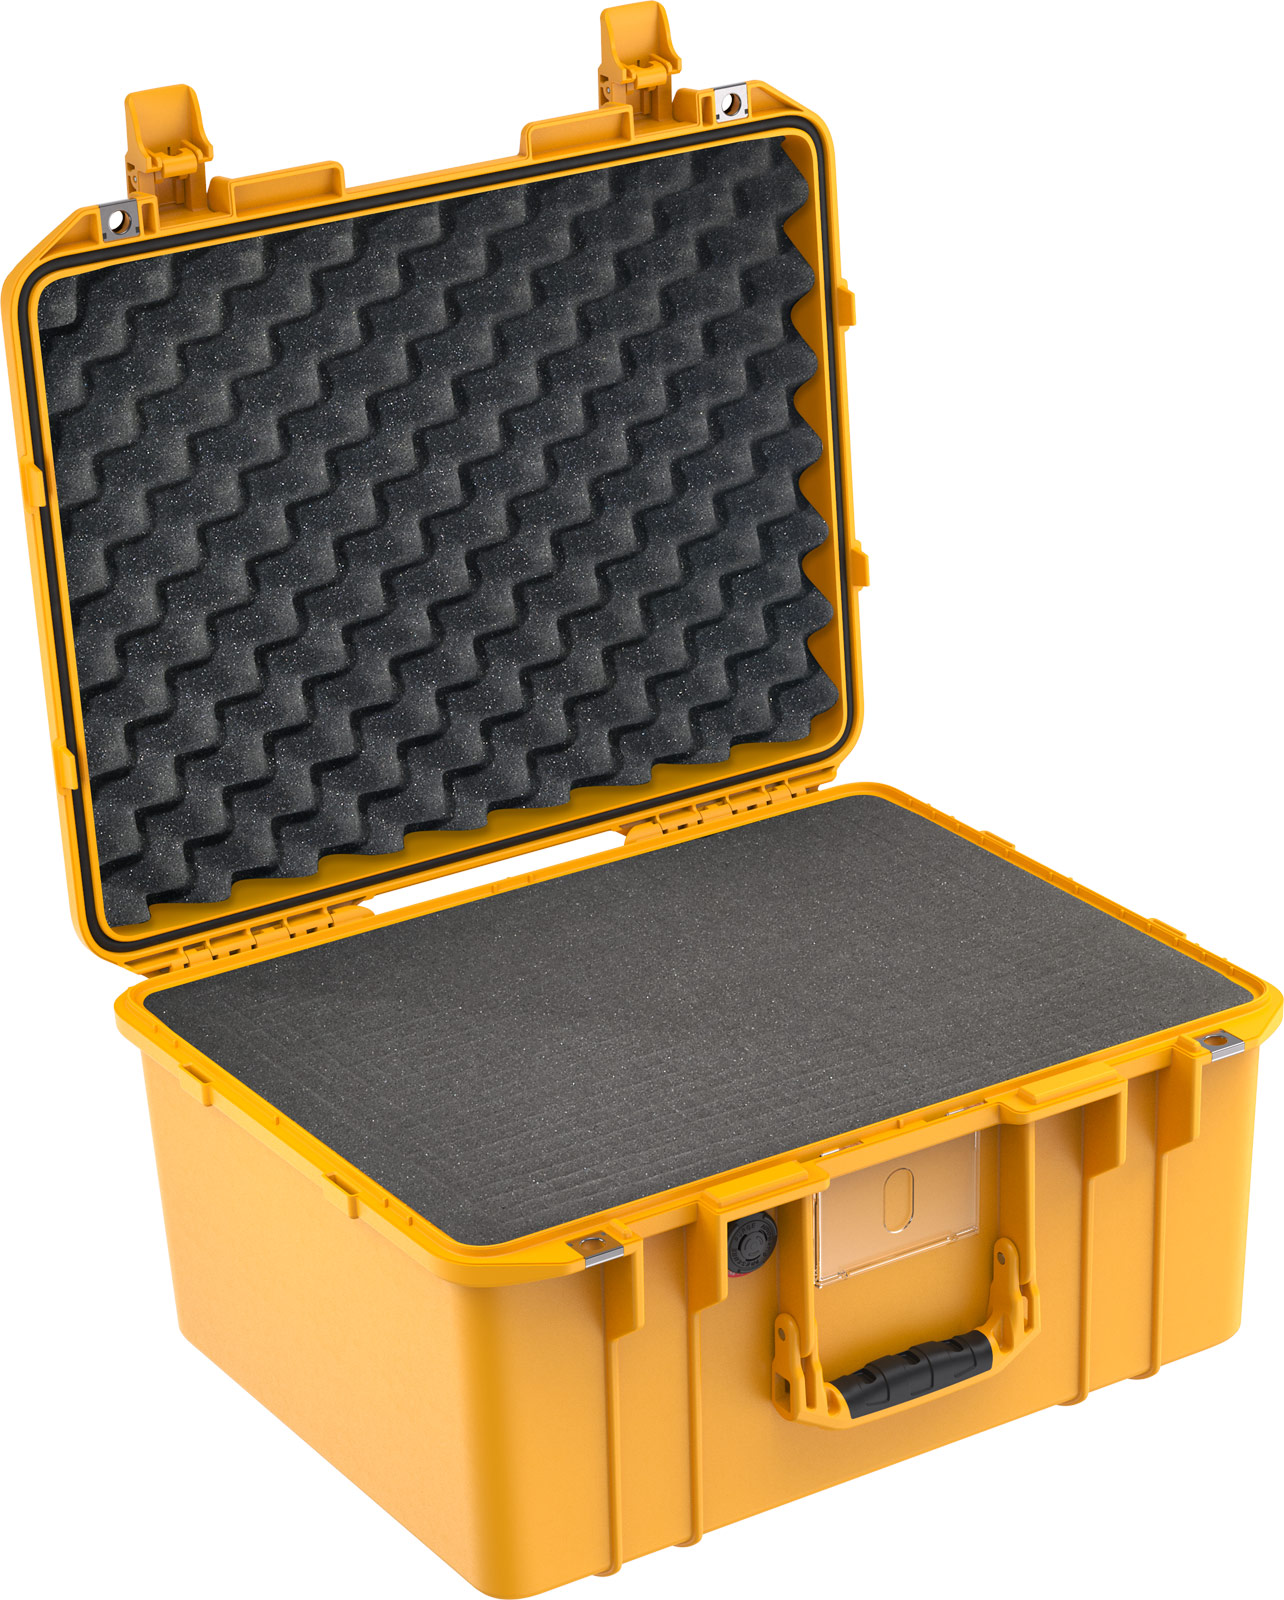 pelican 1557 protection deep case yellow